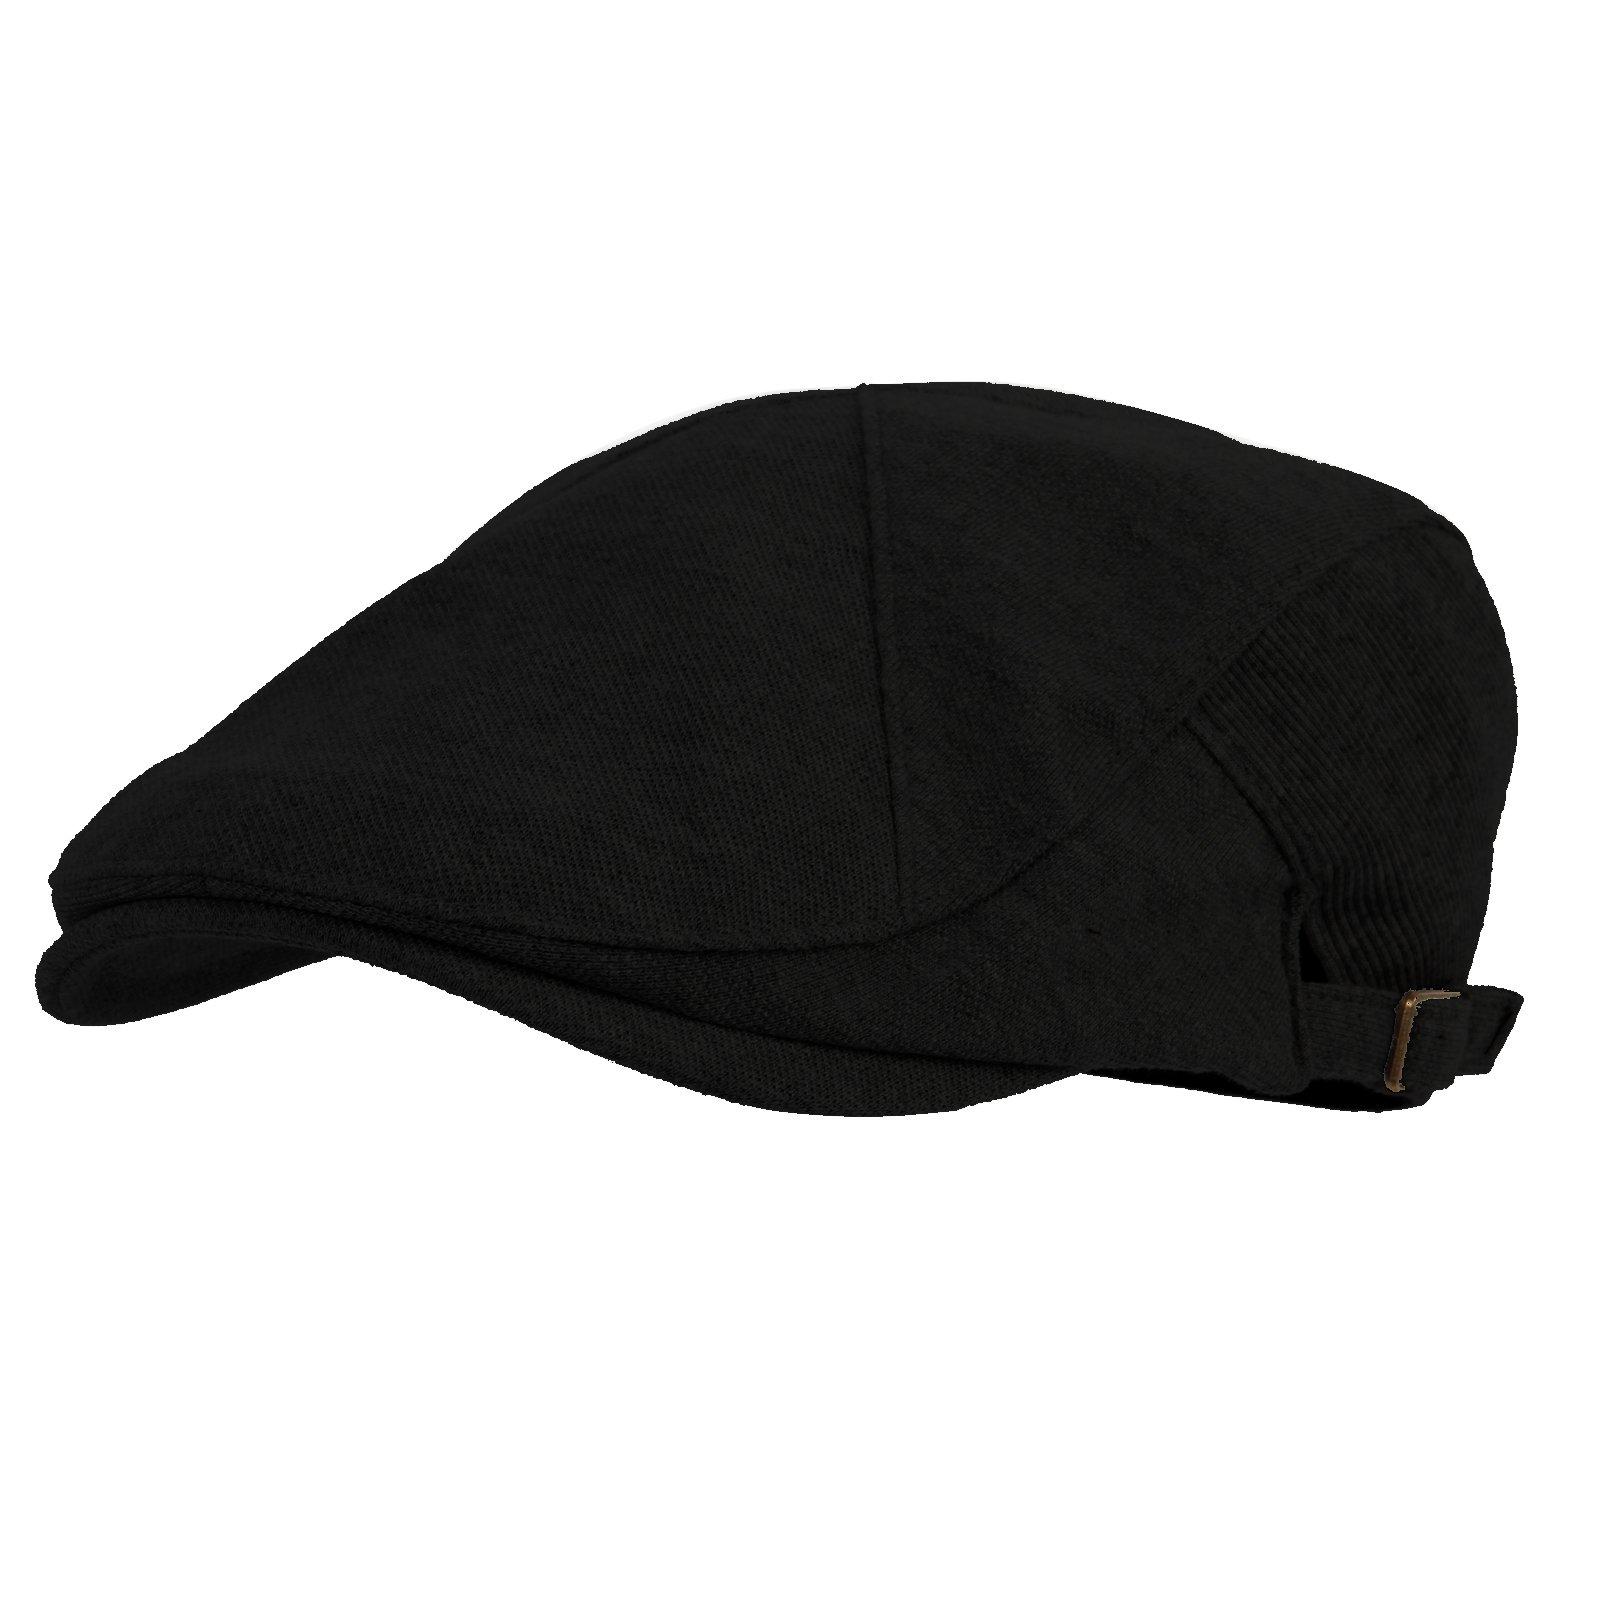 WITHMOONS Modern Cotton Real; Newsboy Hat Flat Cap AC3045 (Black)